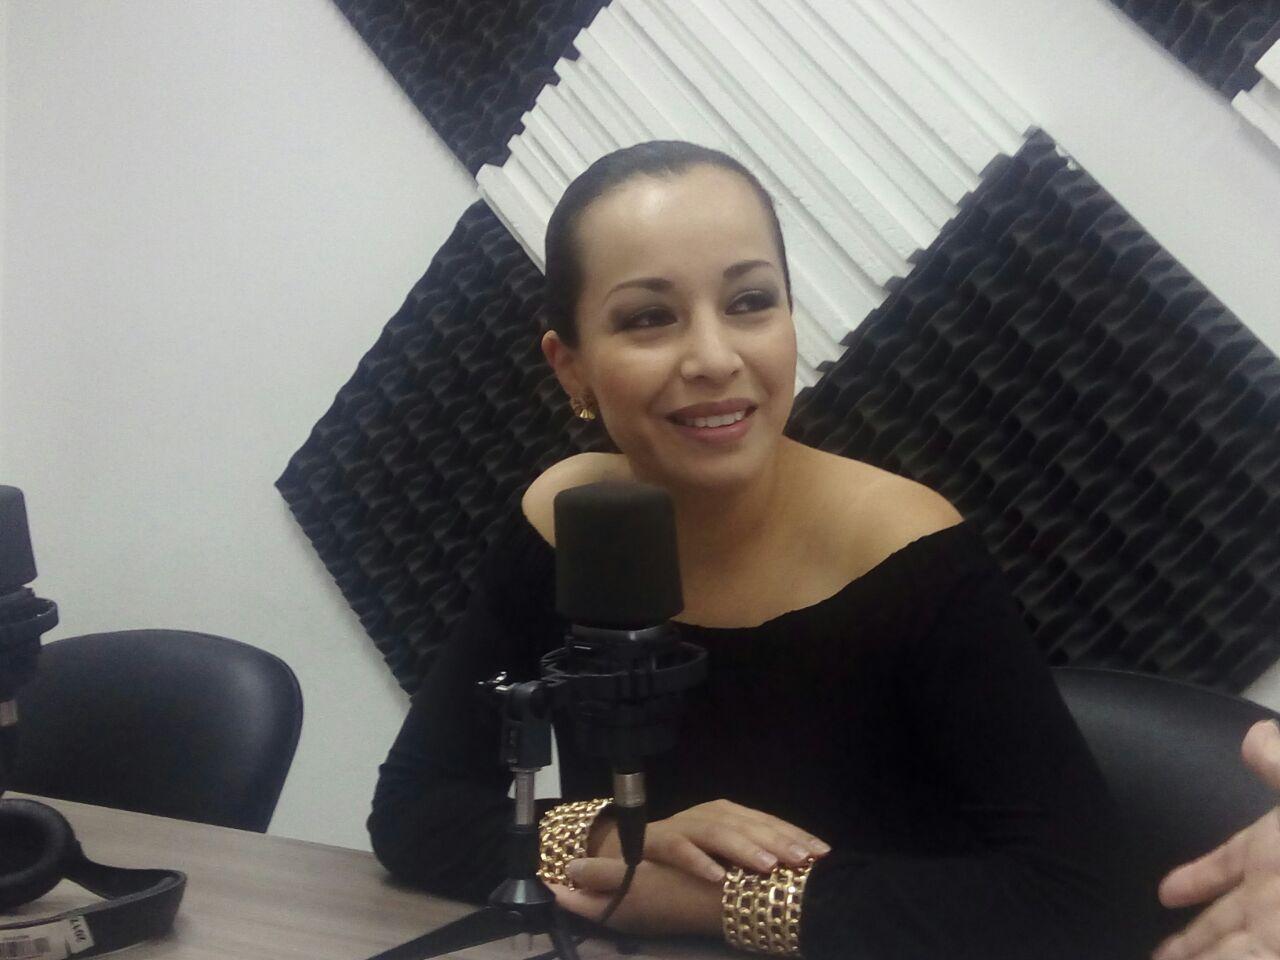 Charlas Legislativas - Verónica Arias: Agenda legislativa